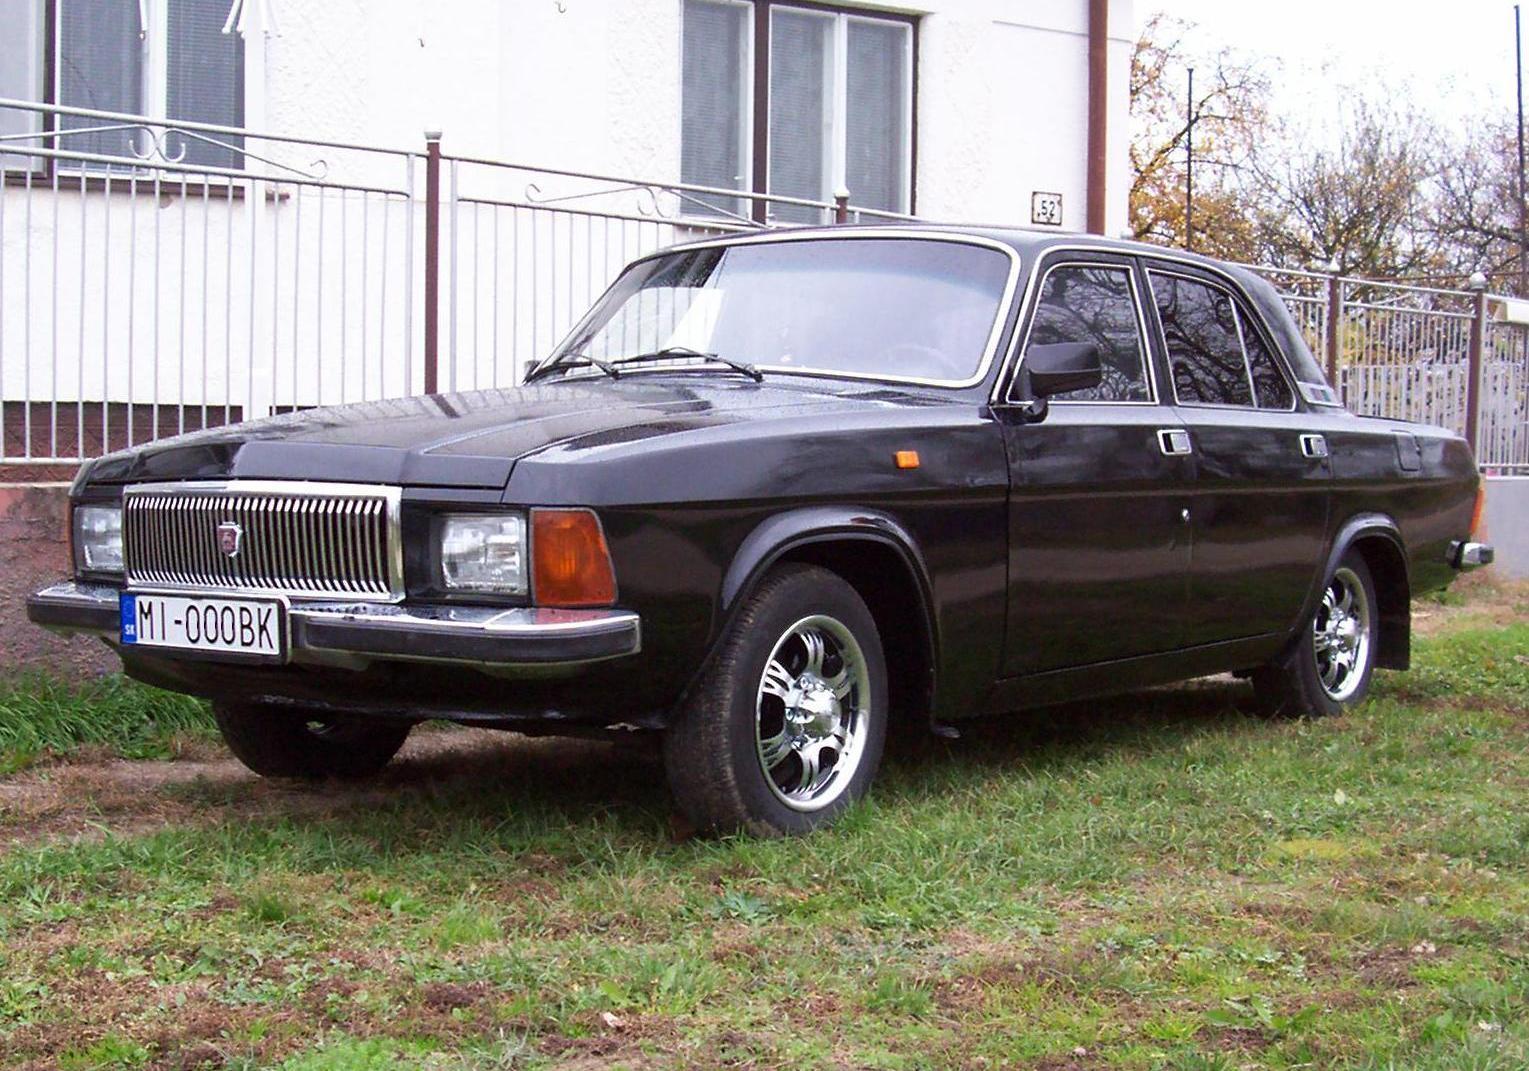 Russia: Volga 3102 (In black)